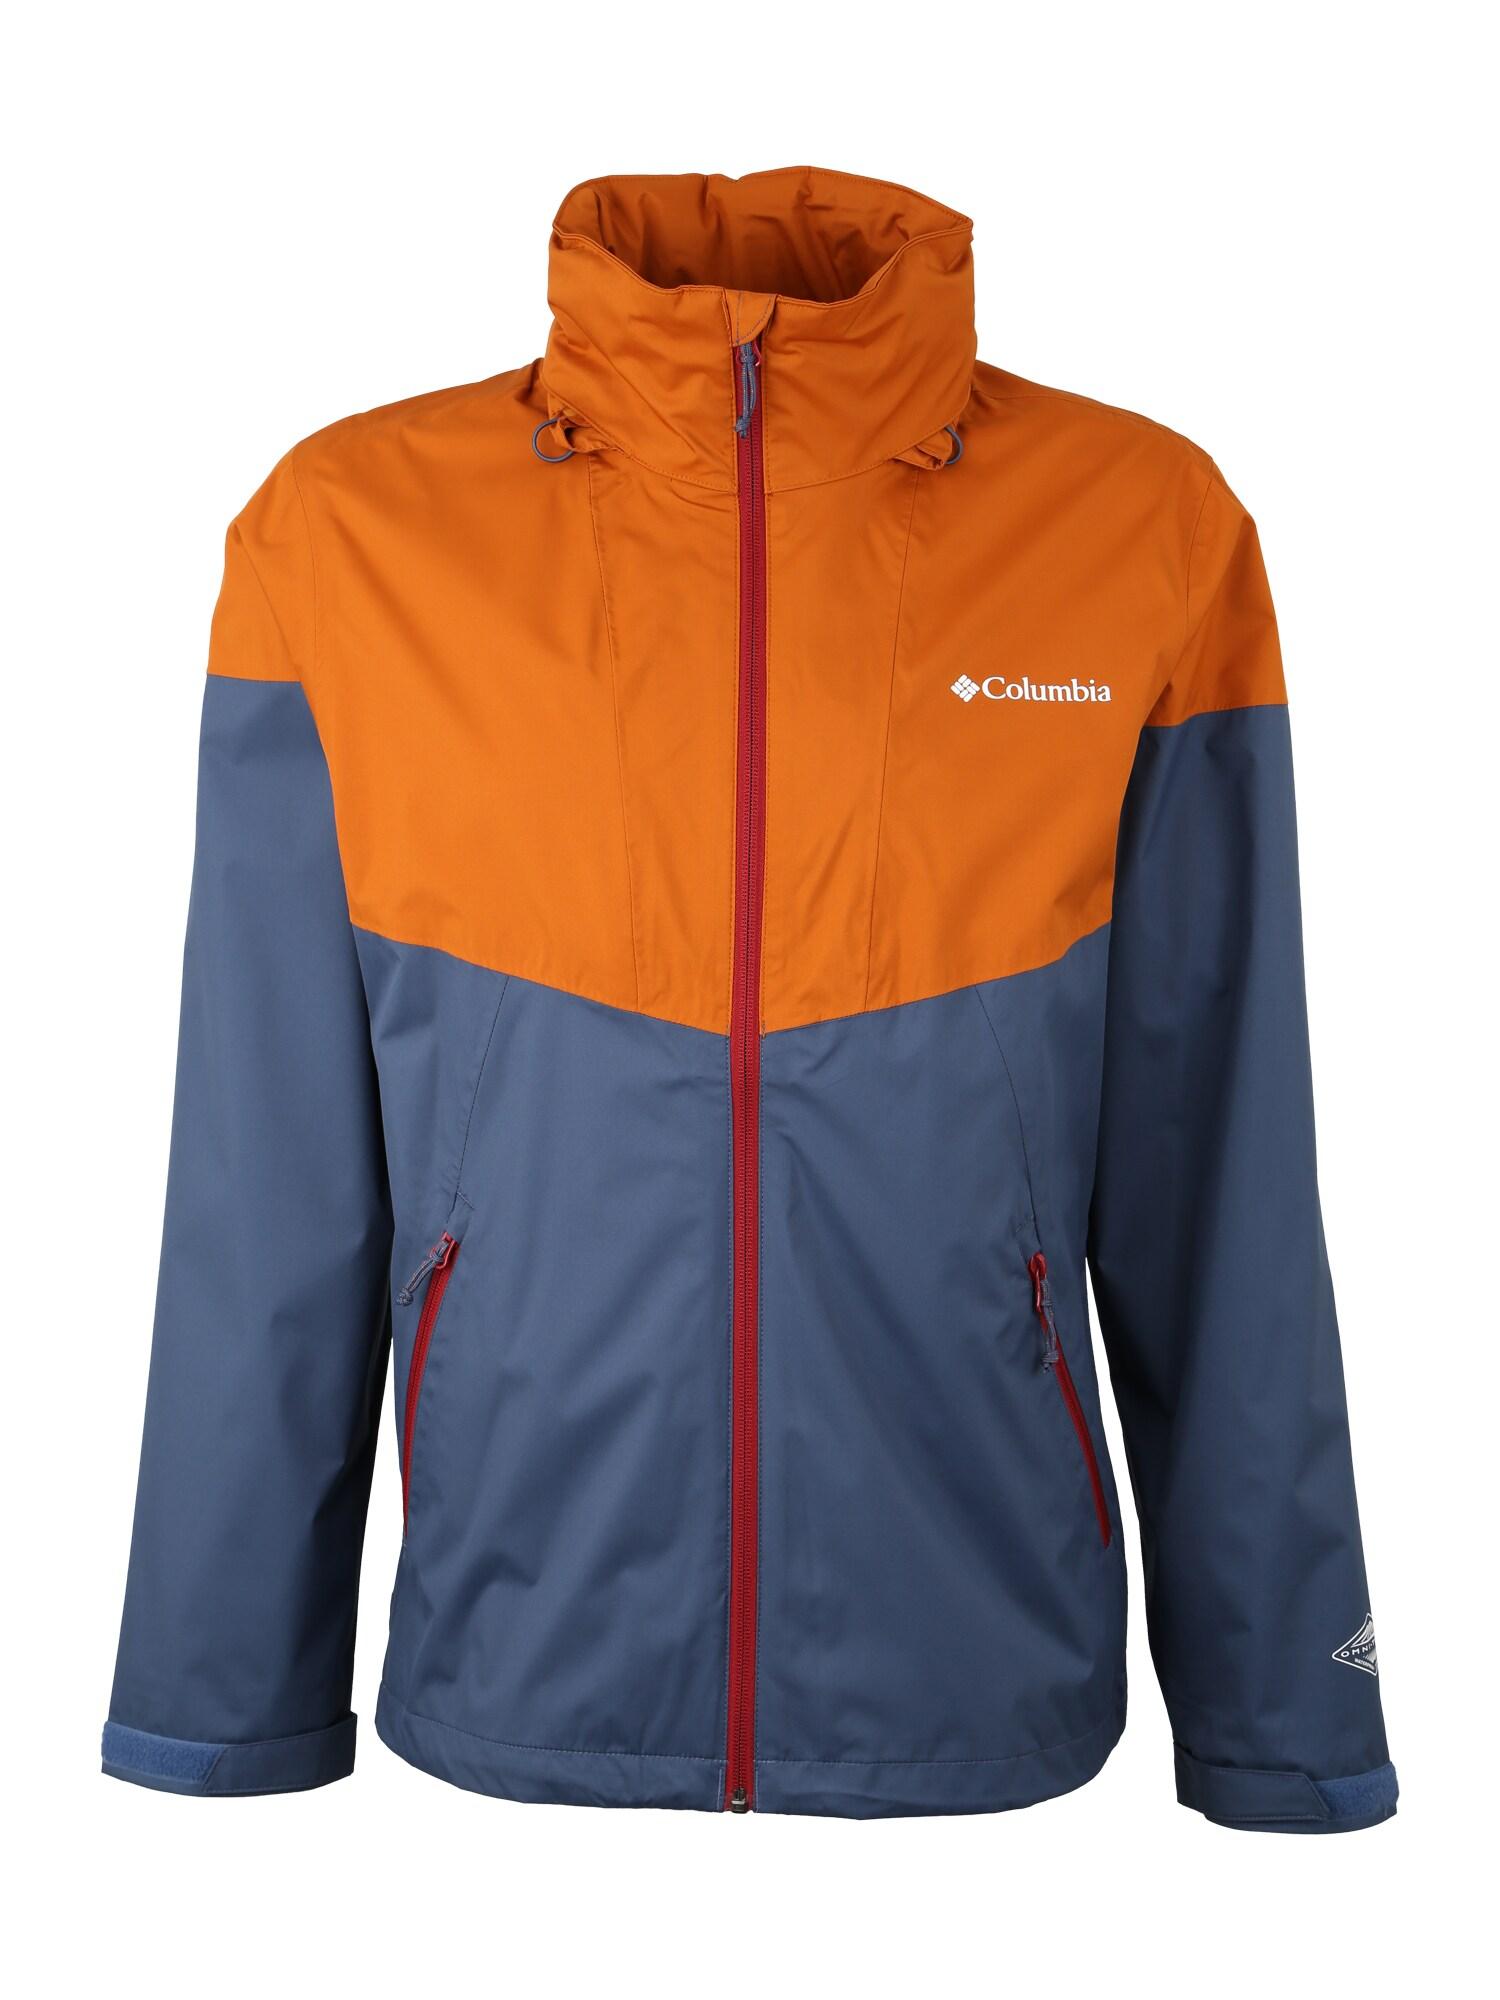 Outdoorová bunda Inner Limits tmavě modrá tmavě oranžová COLUMBIA